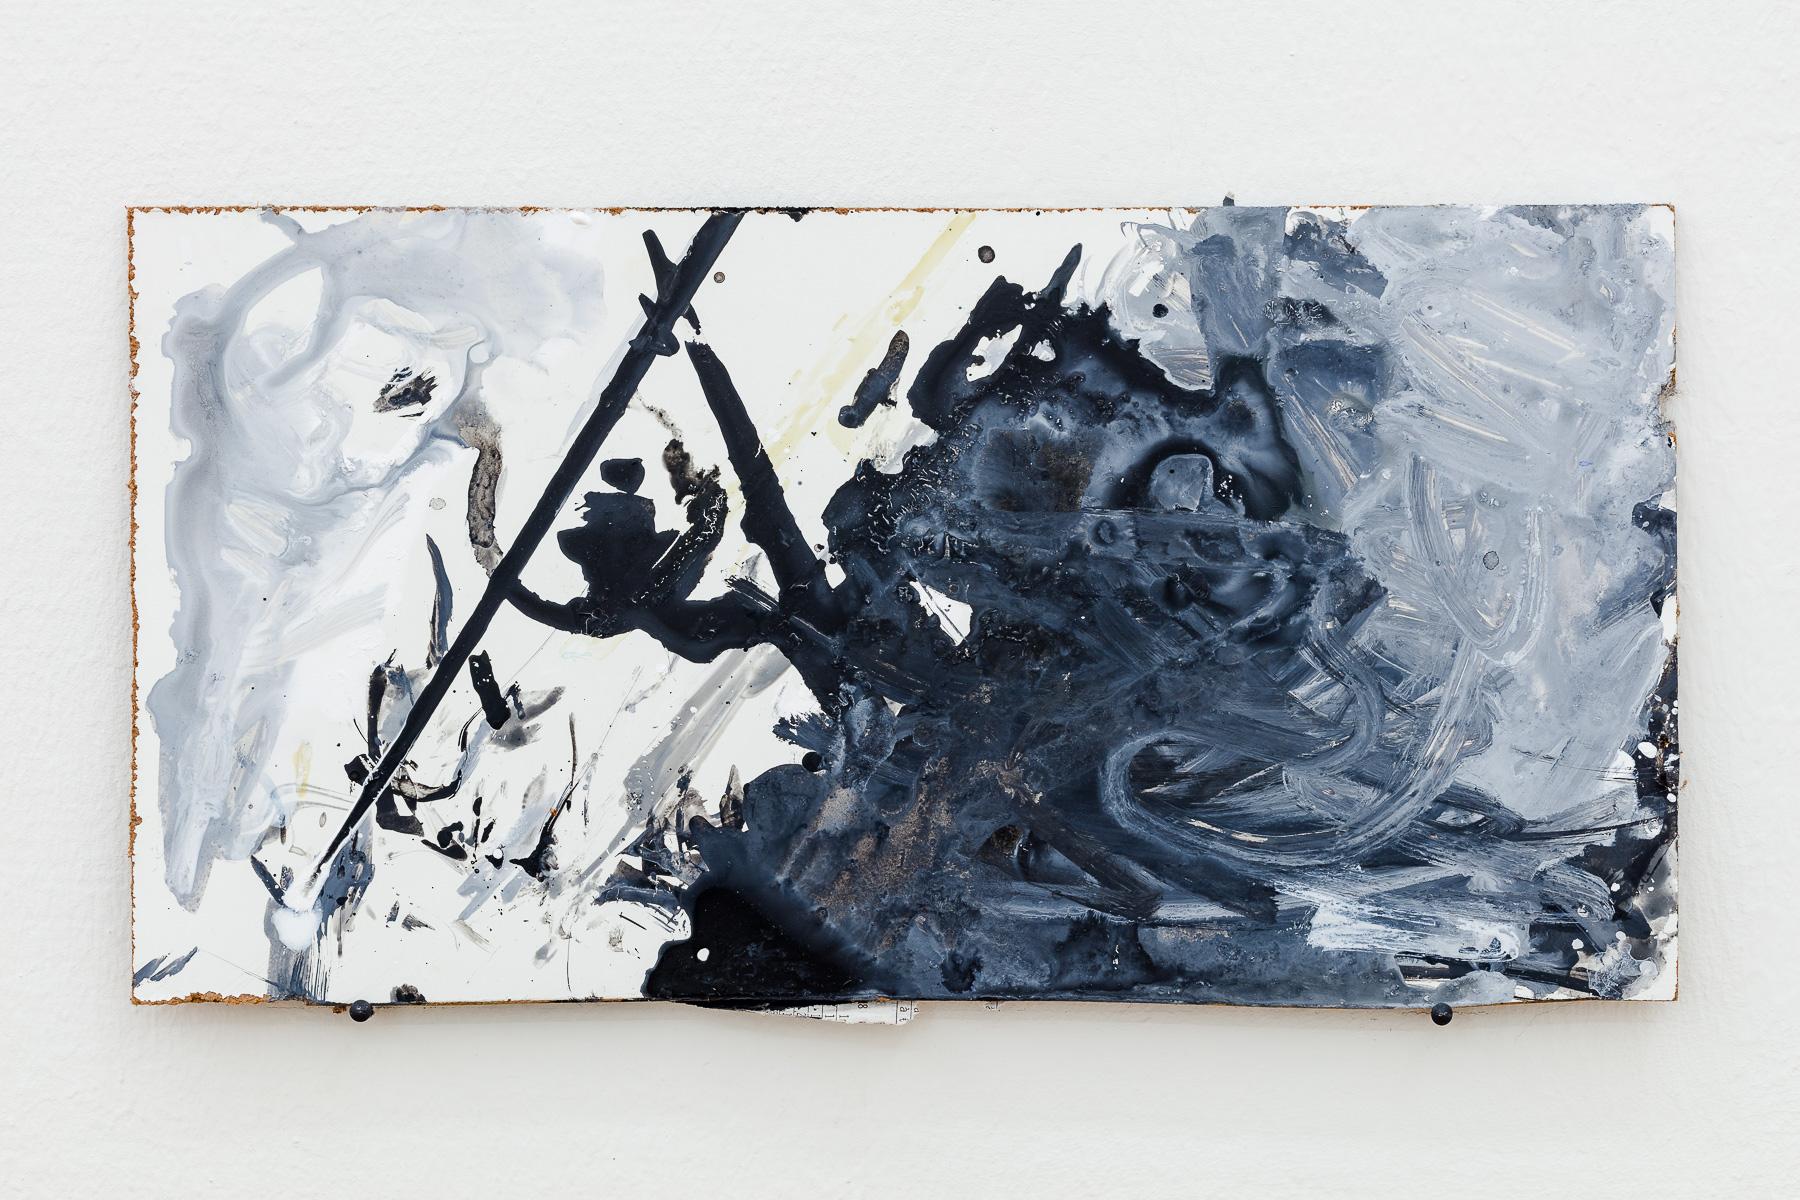 2019_05_20_Elke-Krystufek_Croy-Nielsen_by-kunst-dokumentation-com_005_web.jpg